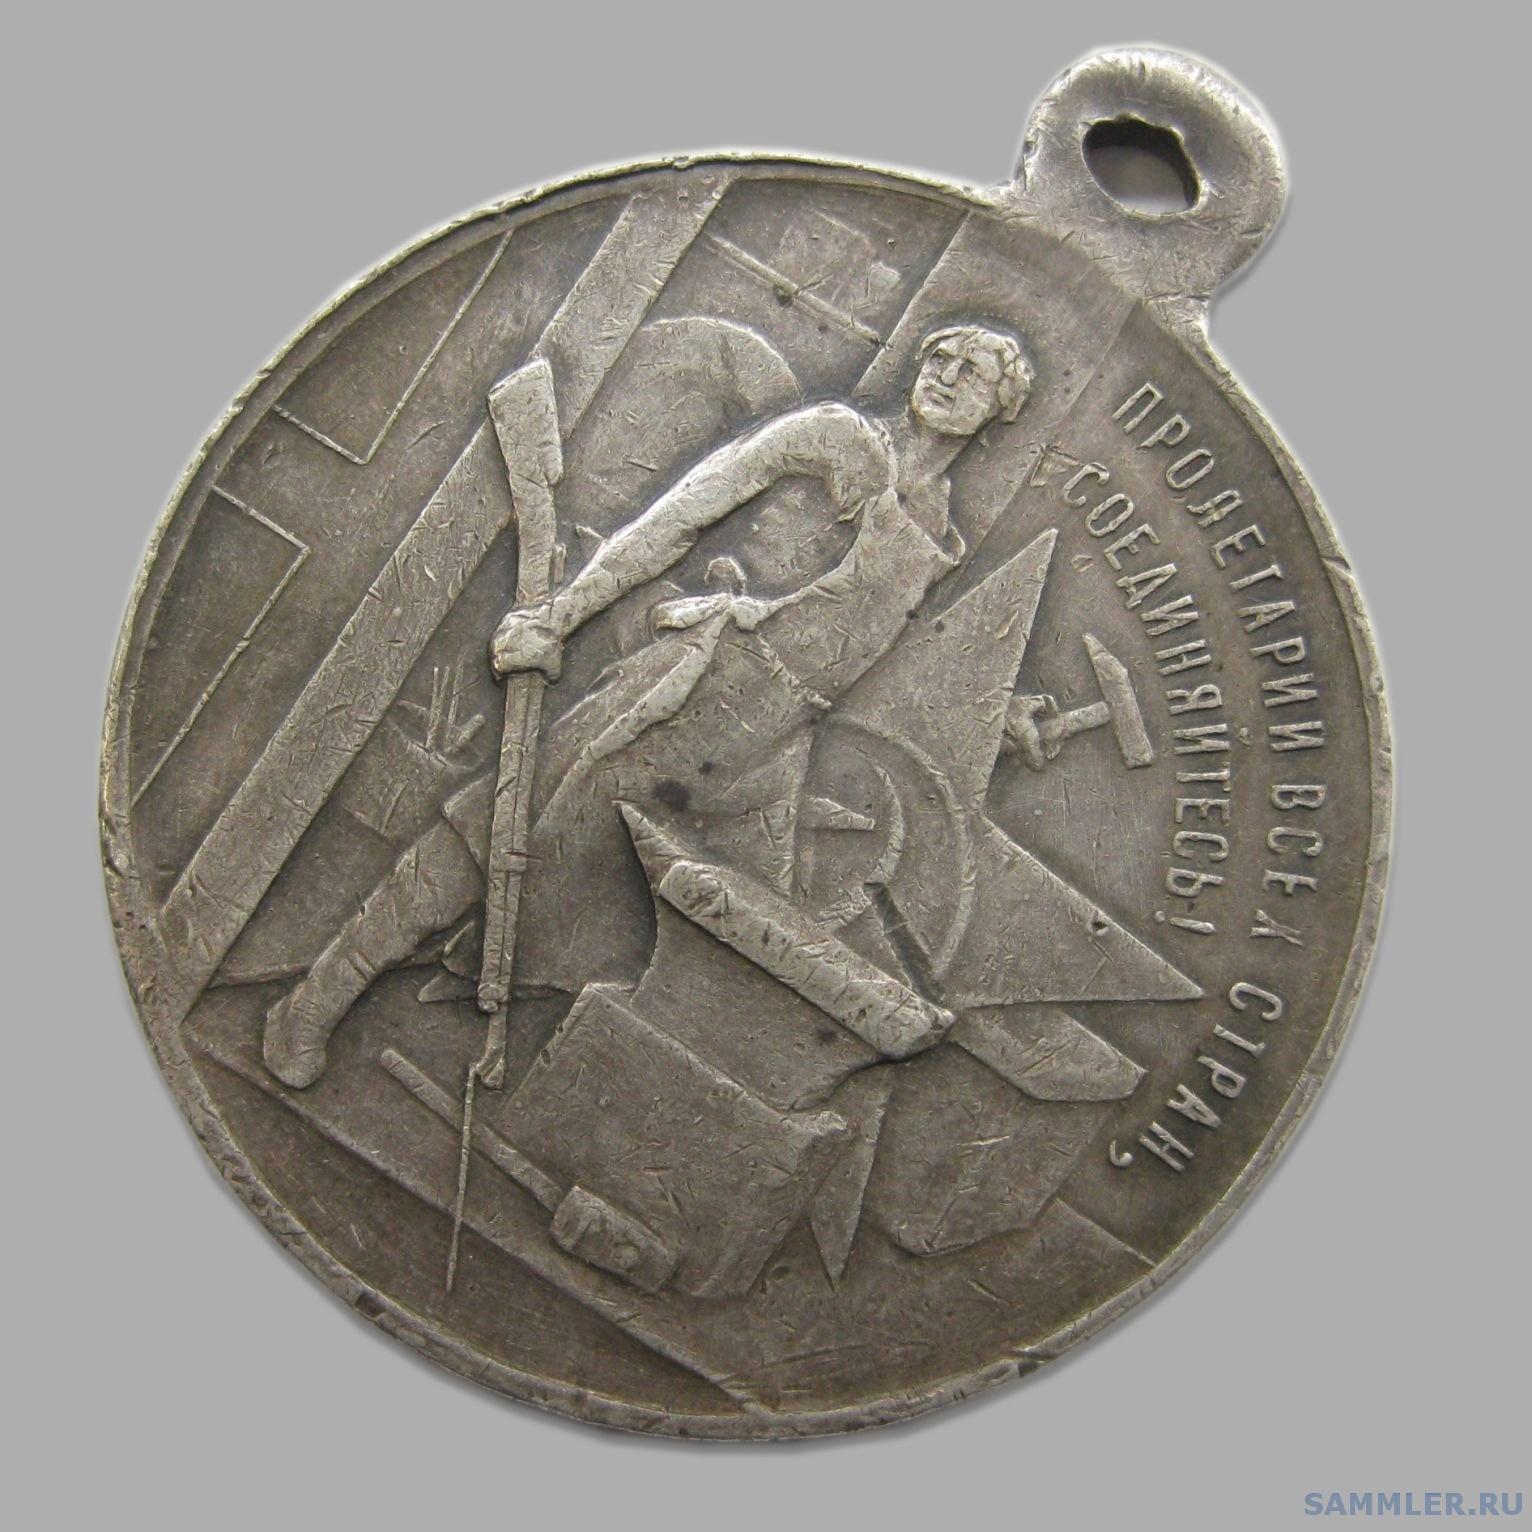 Медаль 3 года ВОР РСФСР октябрь 1917-1920, Серебро_2.jpg